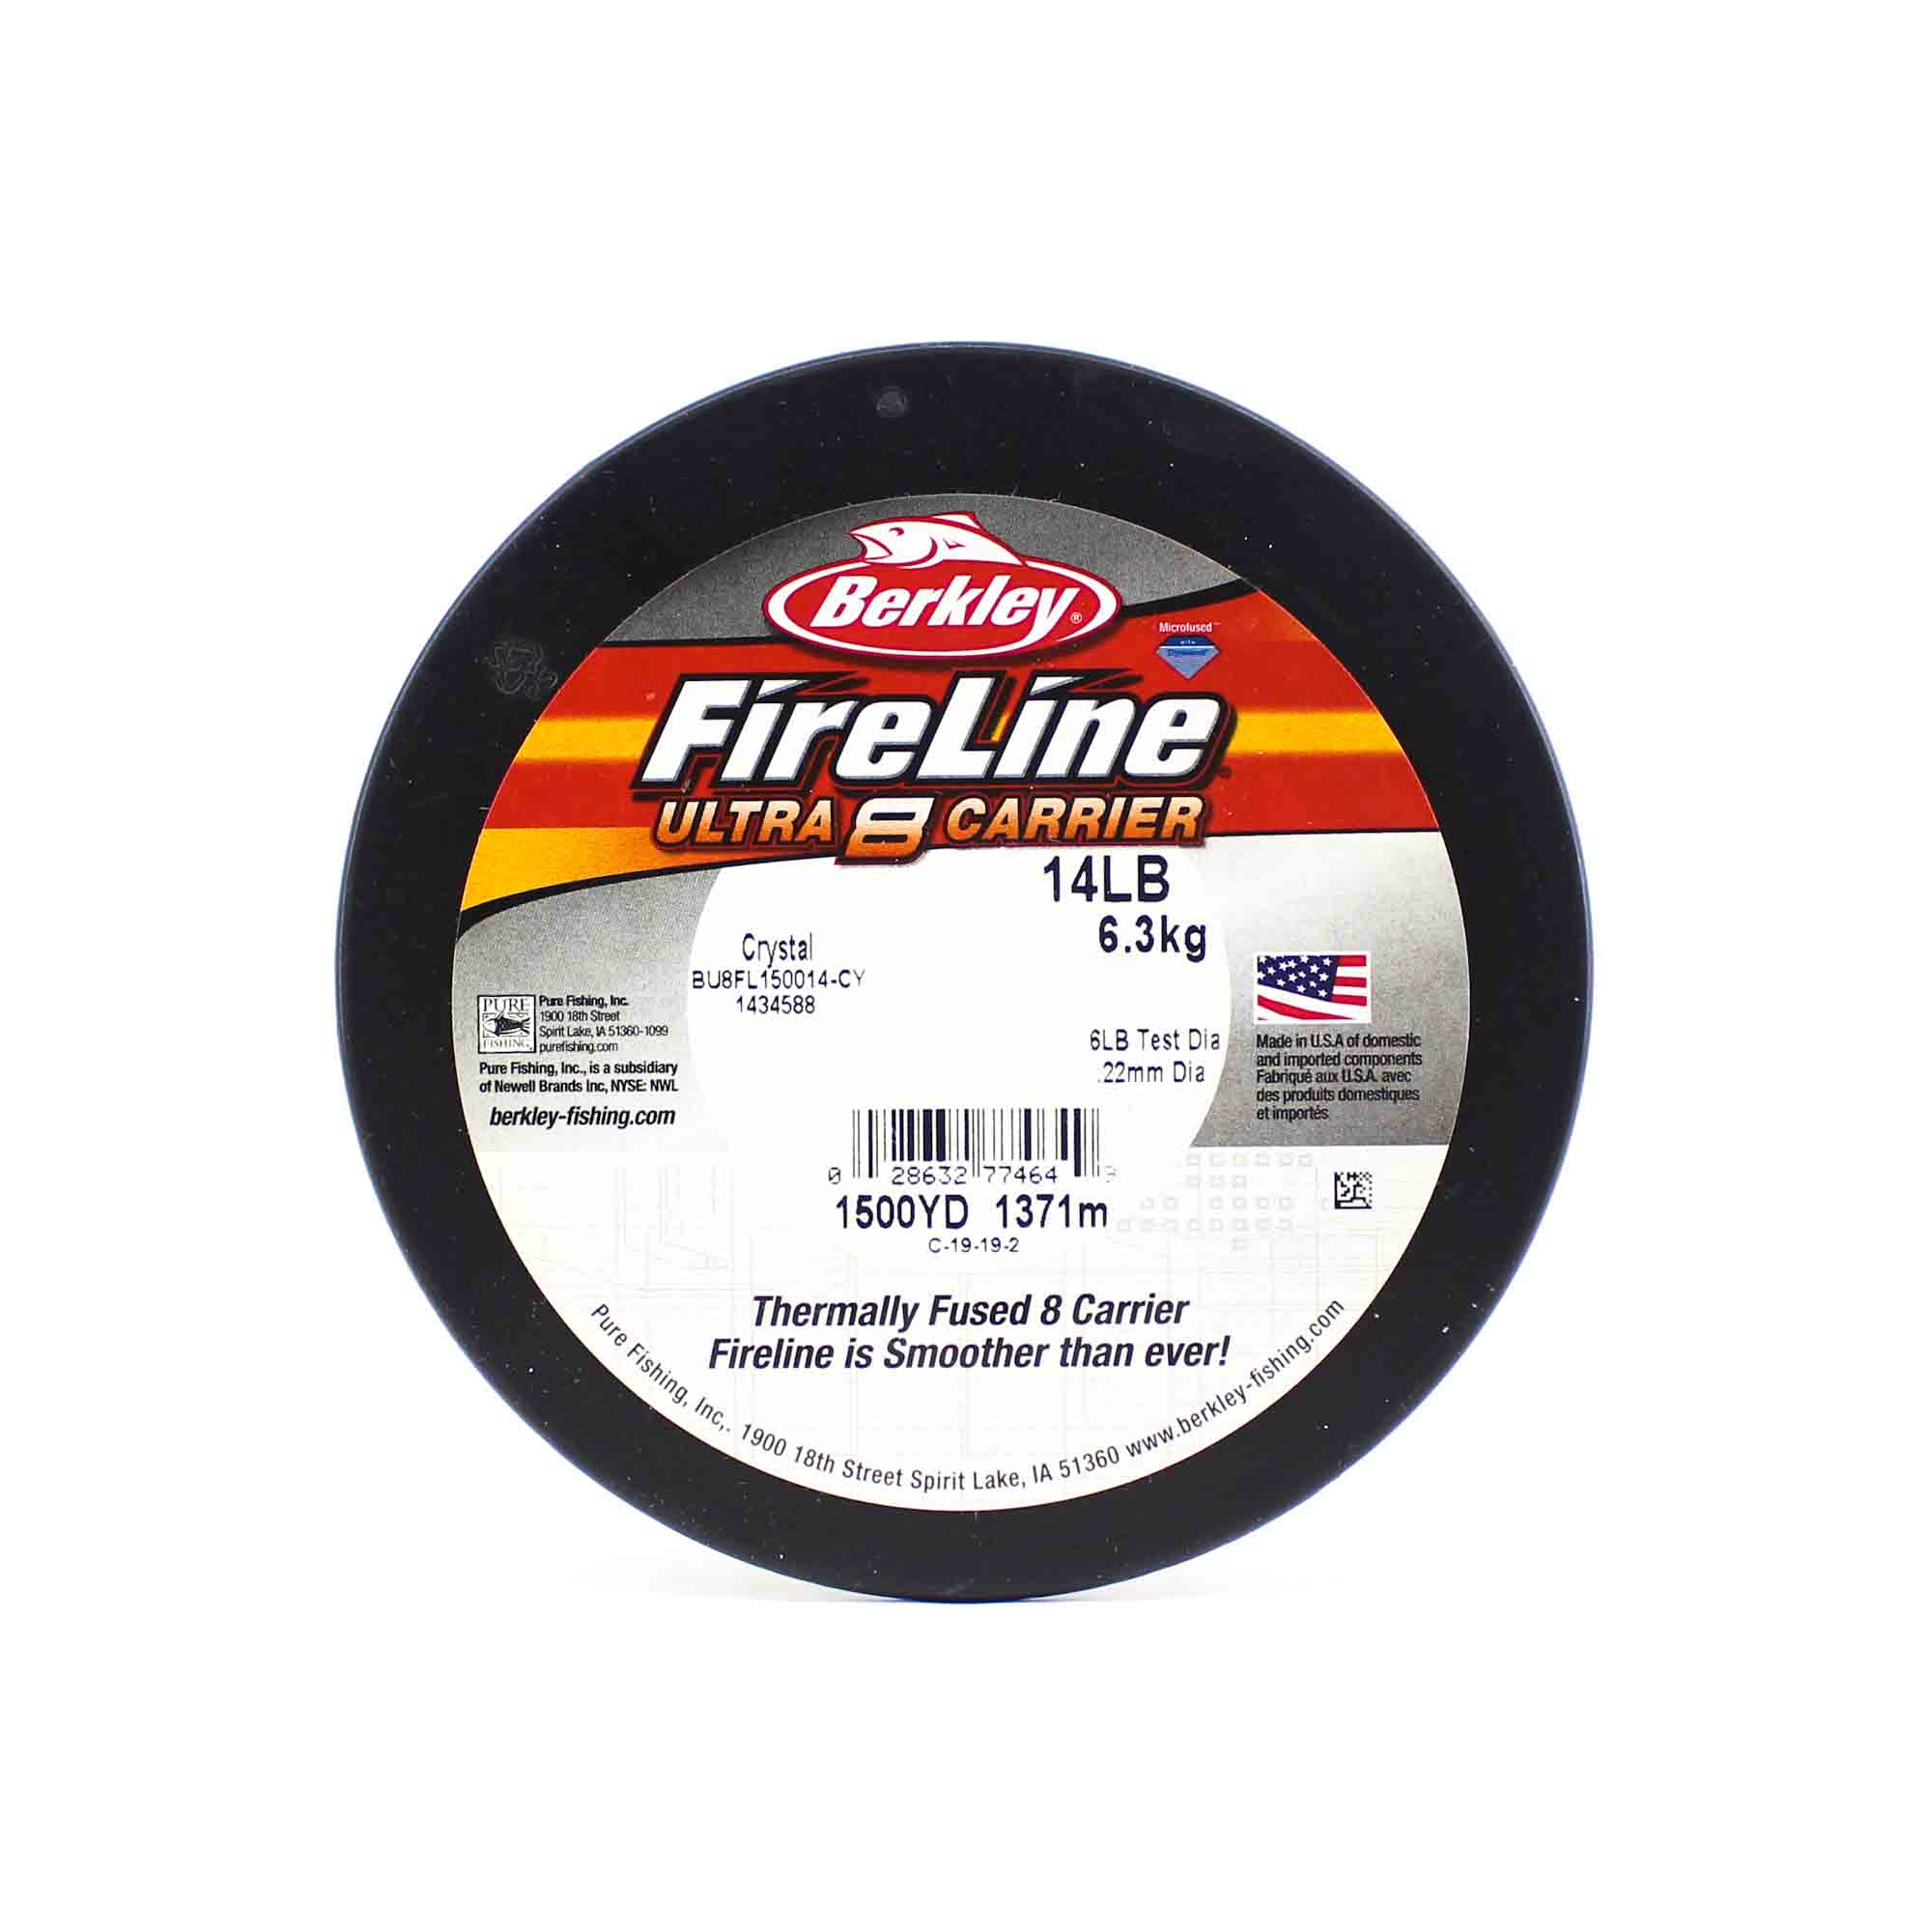 Berkley Fireline Ultra 8 Carrier 1500yds 14lb White (4649)